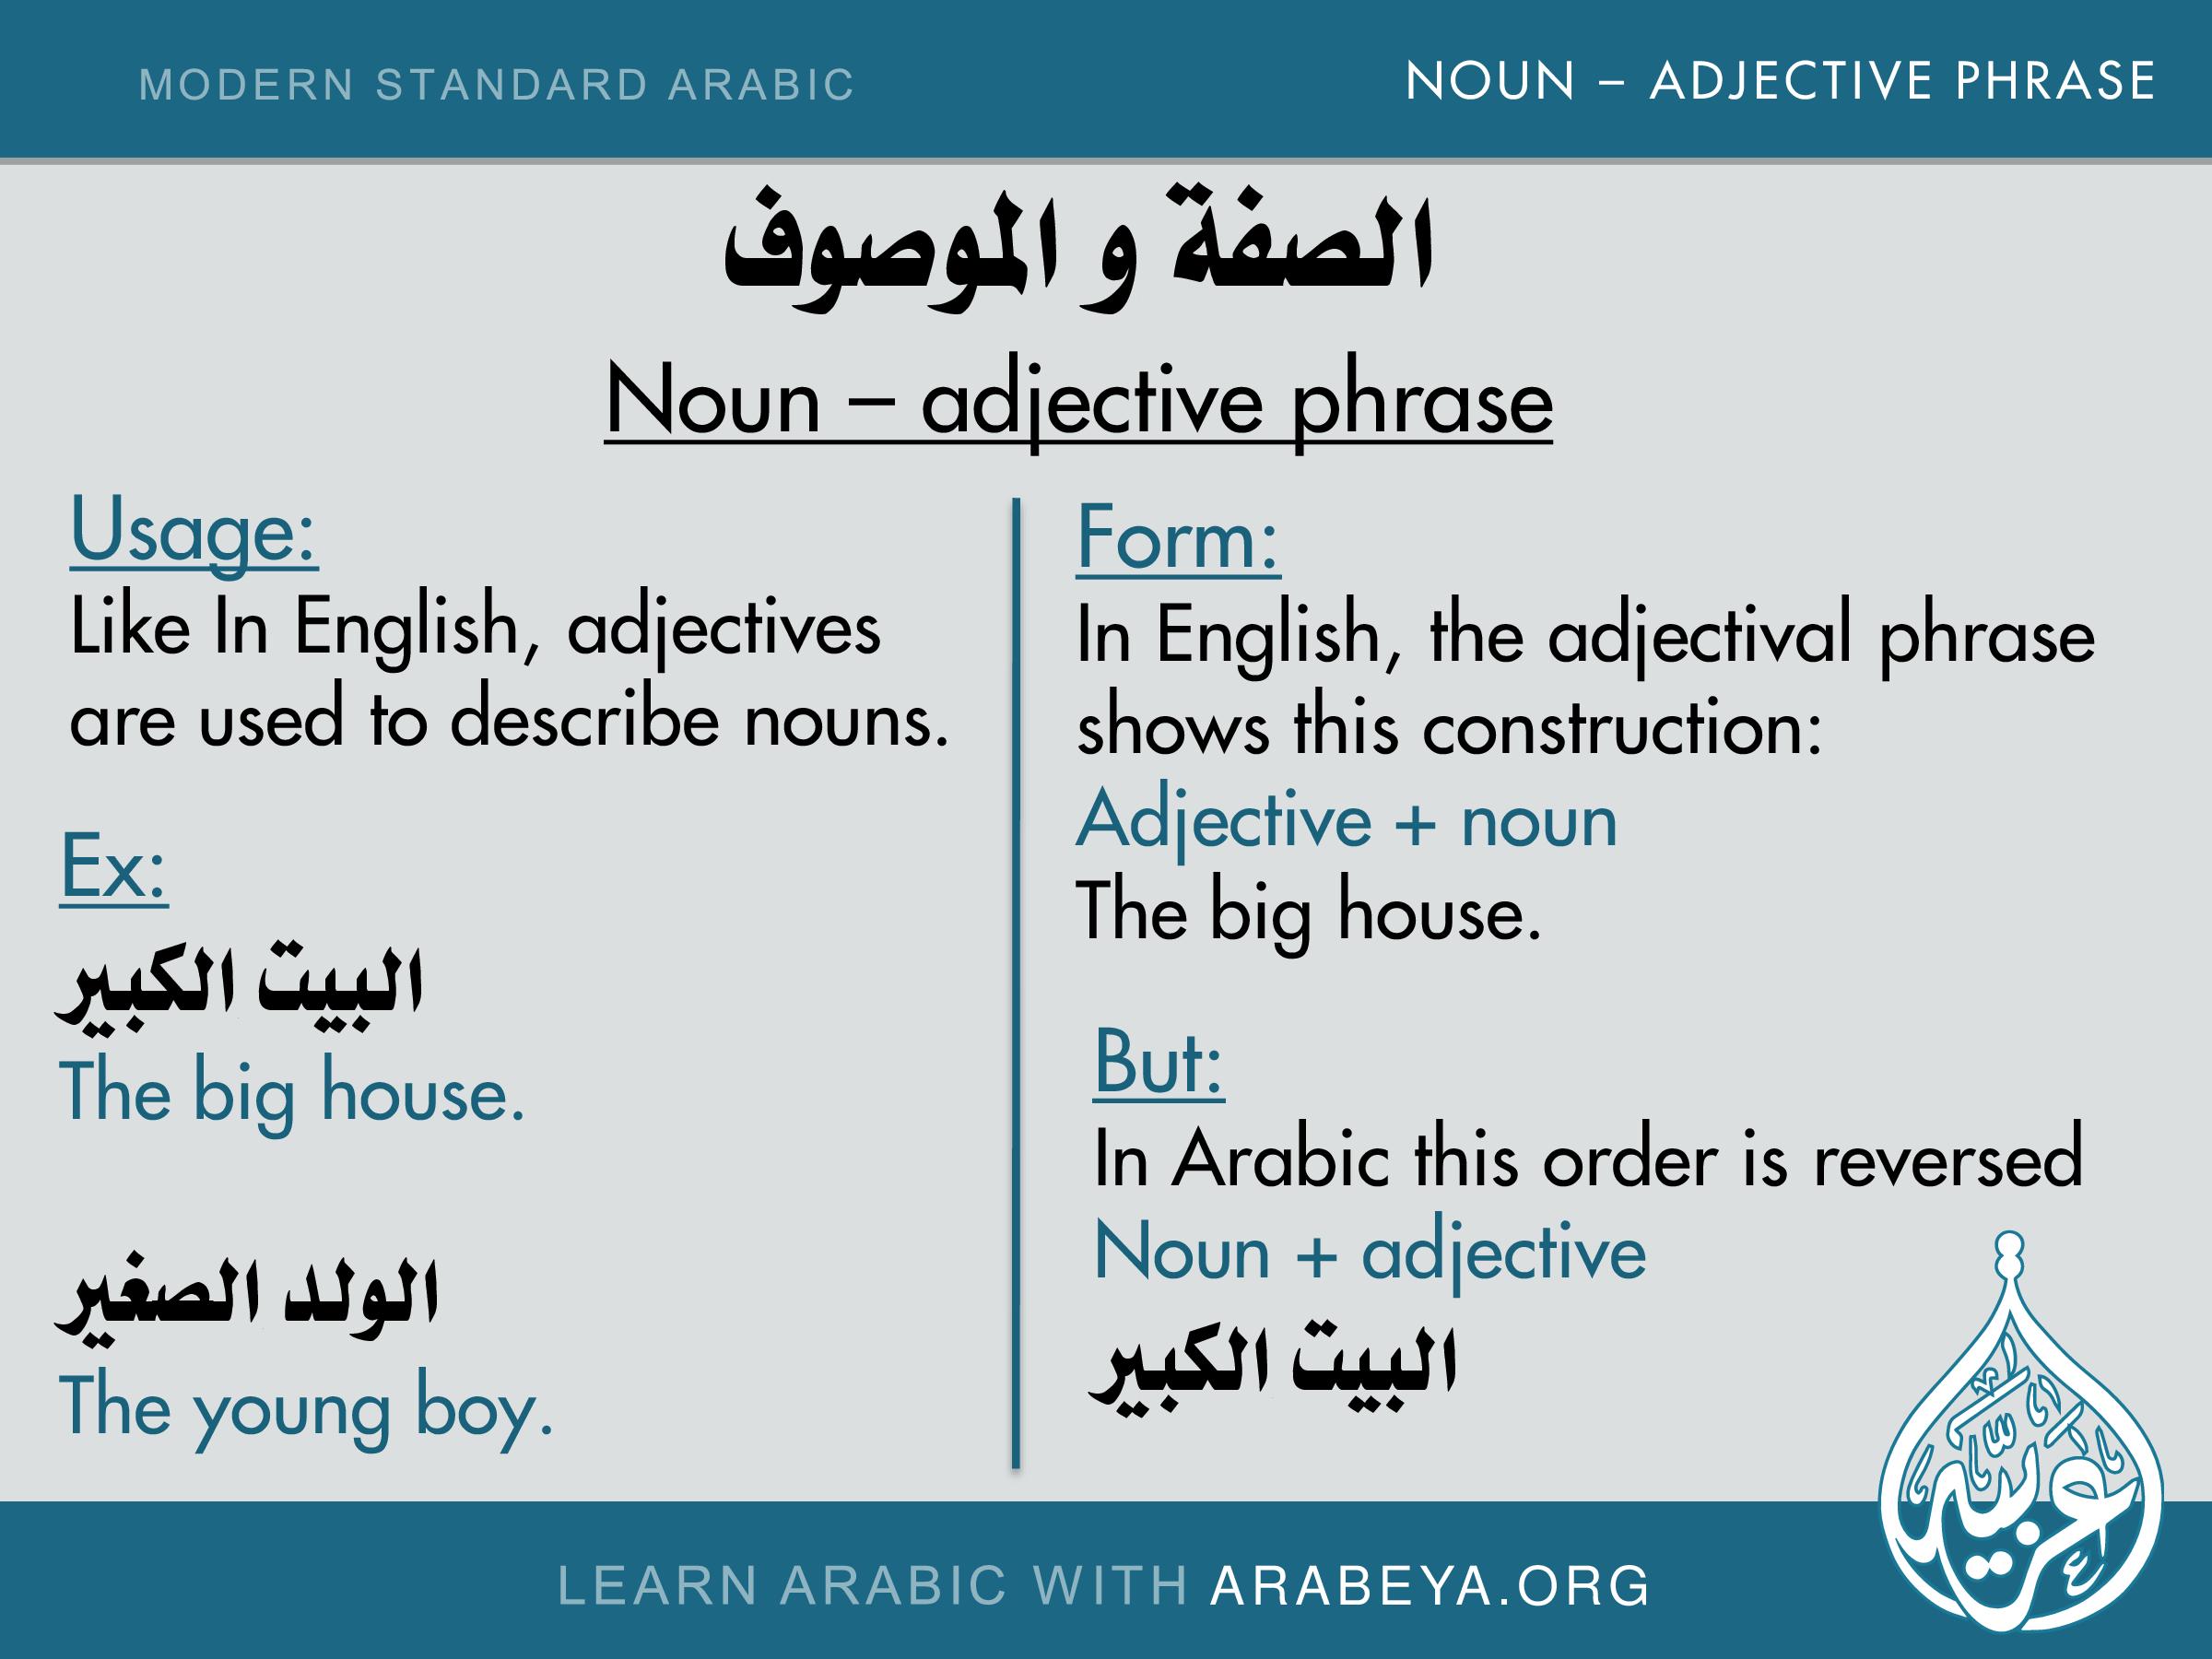 Noun Adjective Phrase Usage